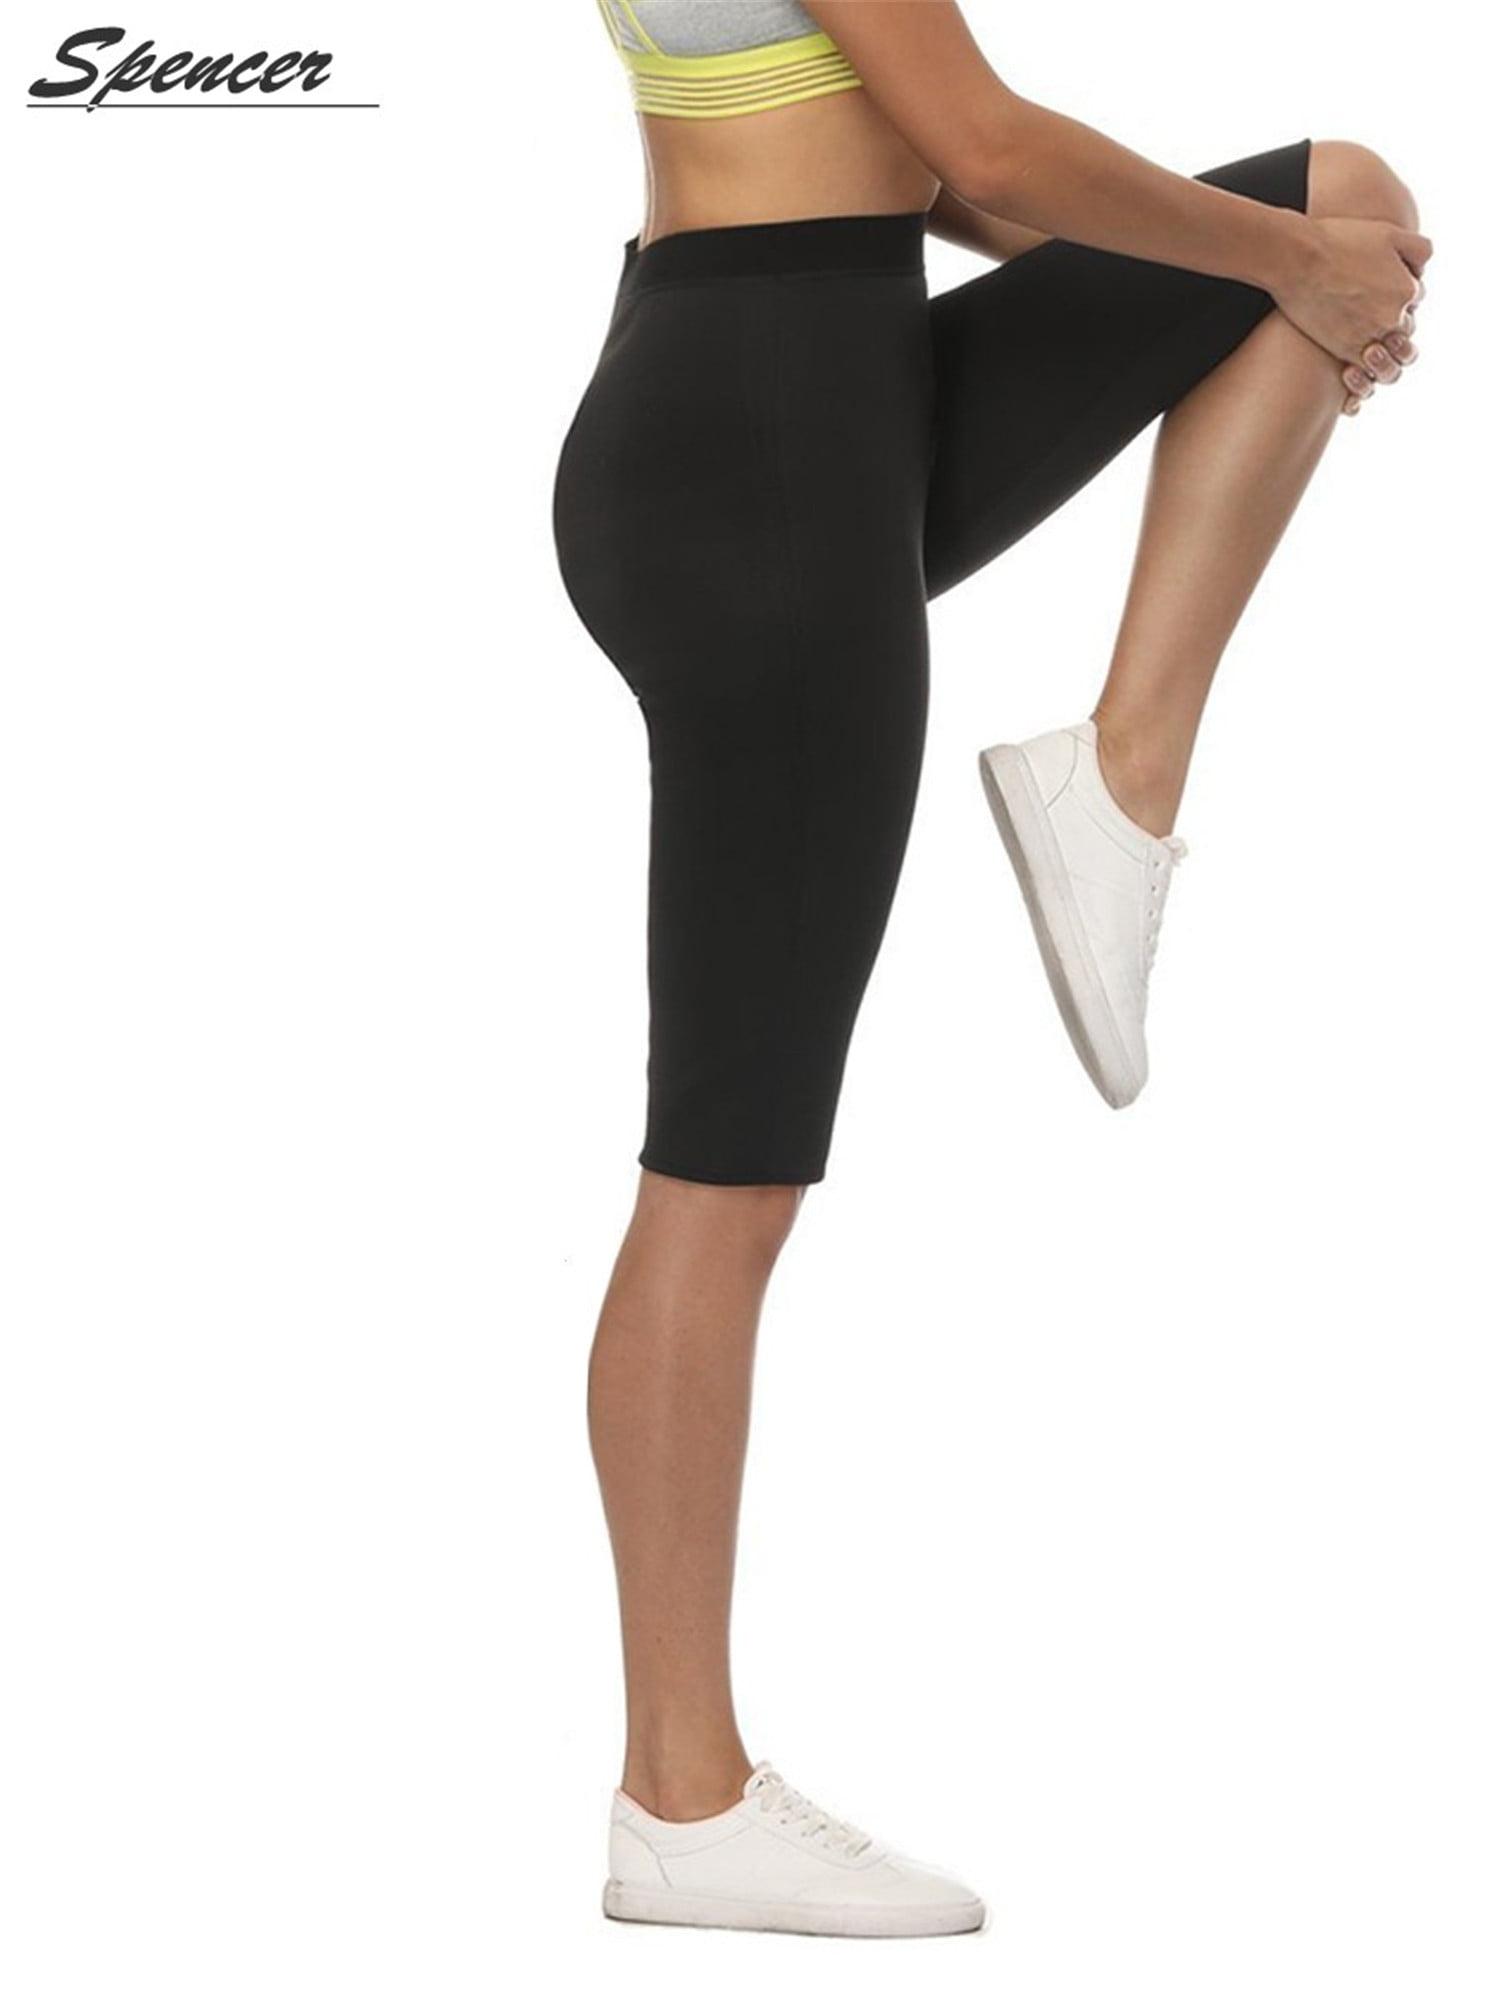 a043ef9cdc318 Spencer - Spencer Women s High Waist Slimming Fat Burning Pants Body  Shapewear Capris Sauna Workout Shaping Pants - Black XL - Walmart.com